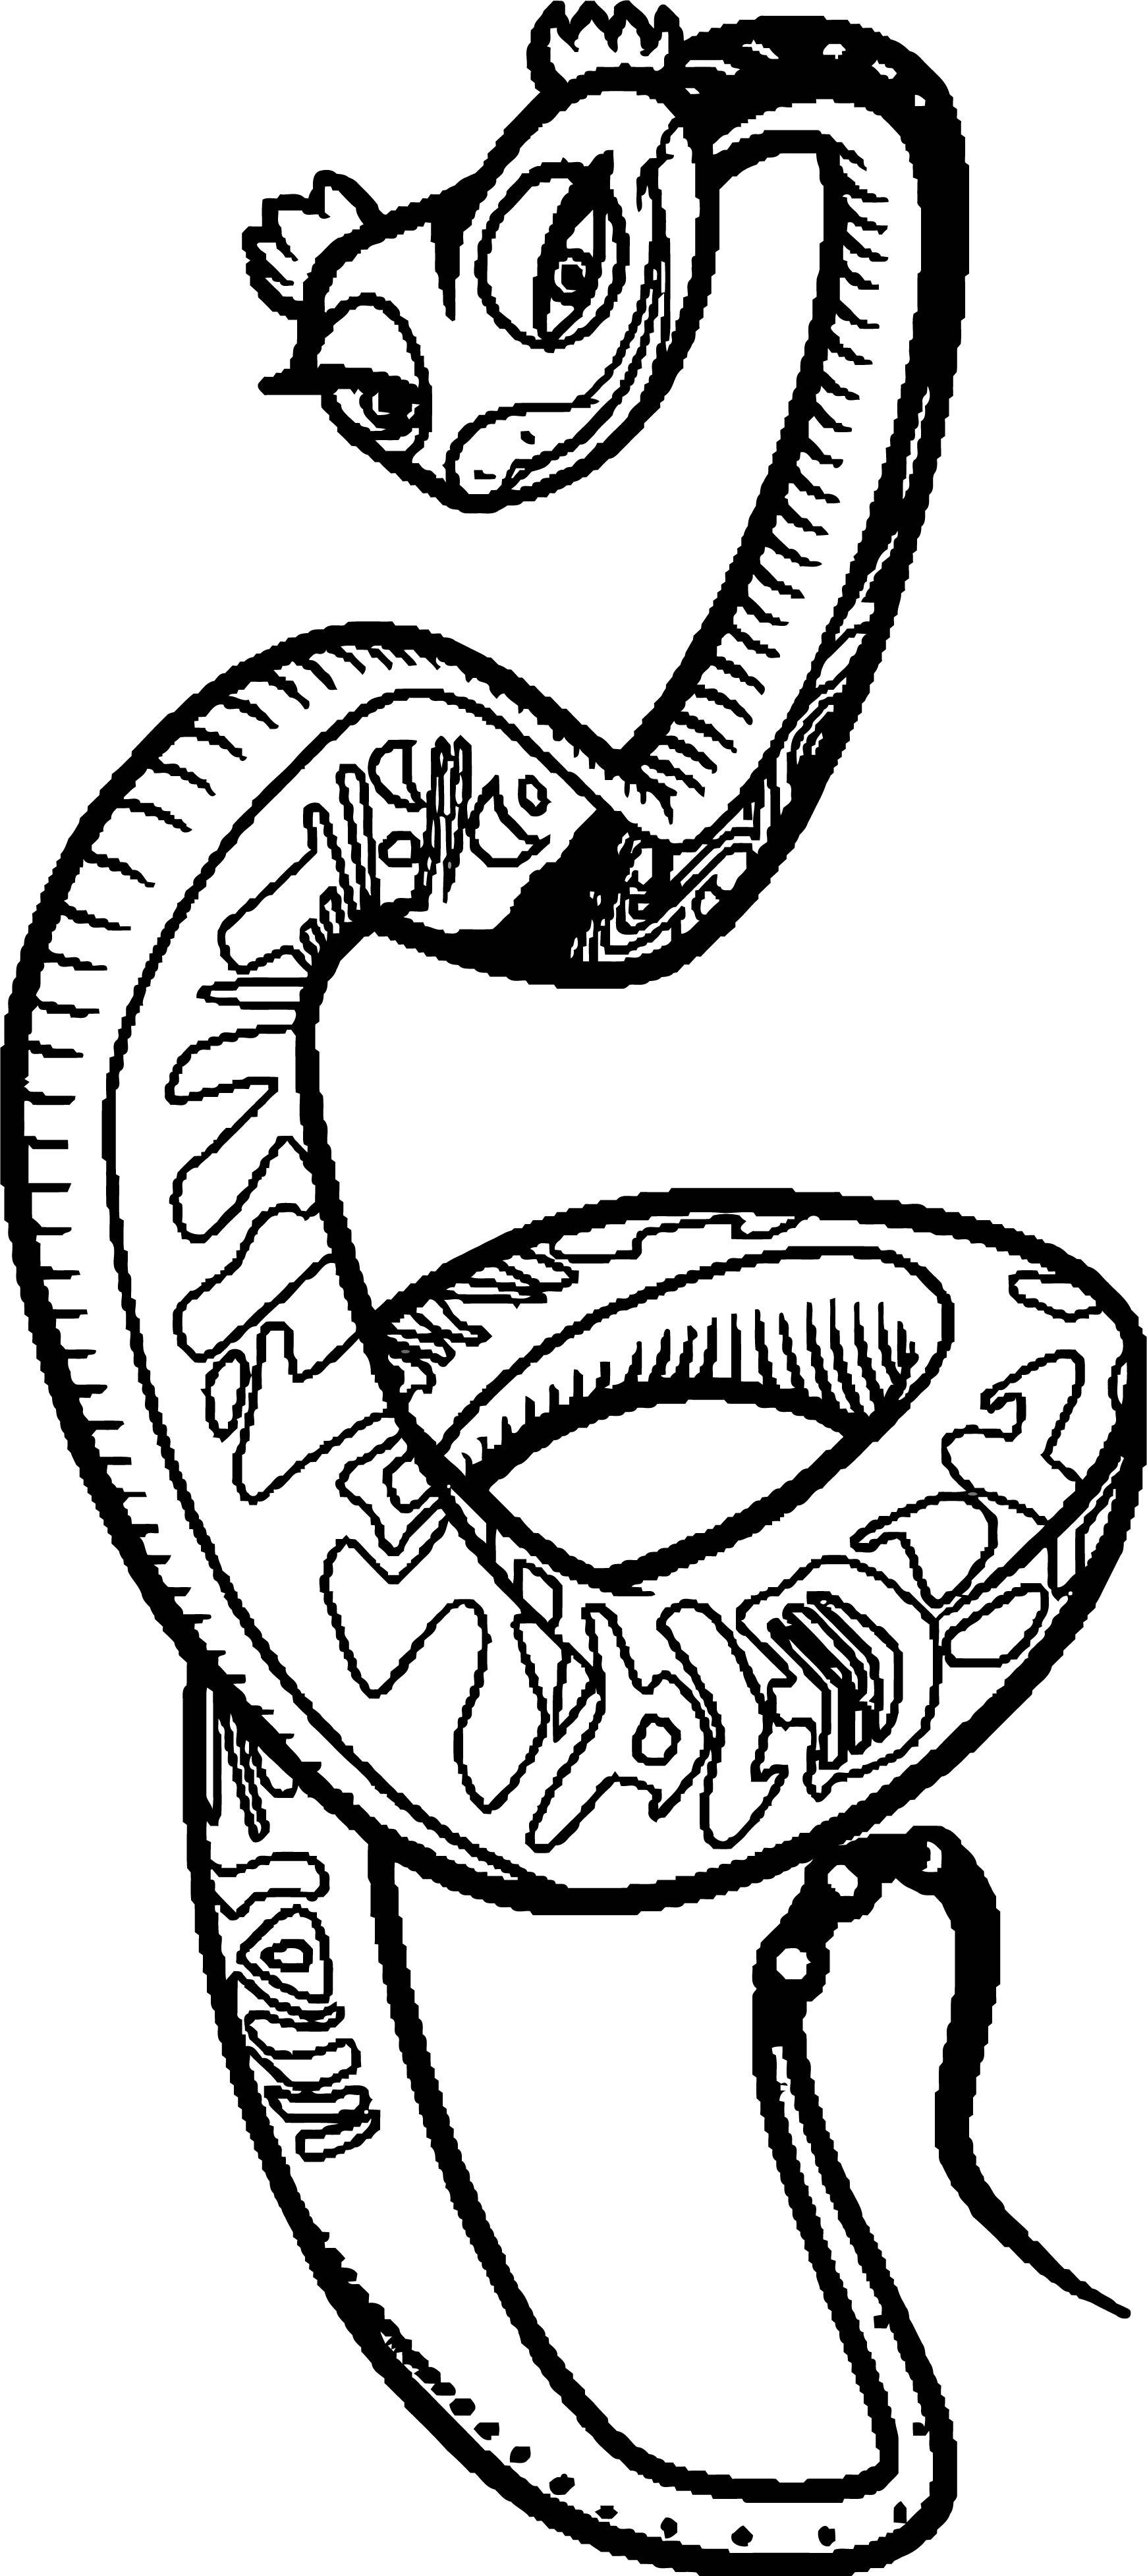 Kung Fu Panda Helix Snake Coloring Page